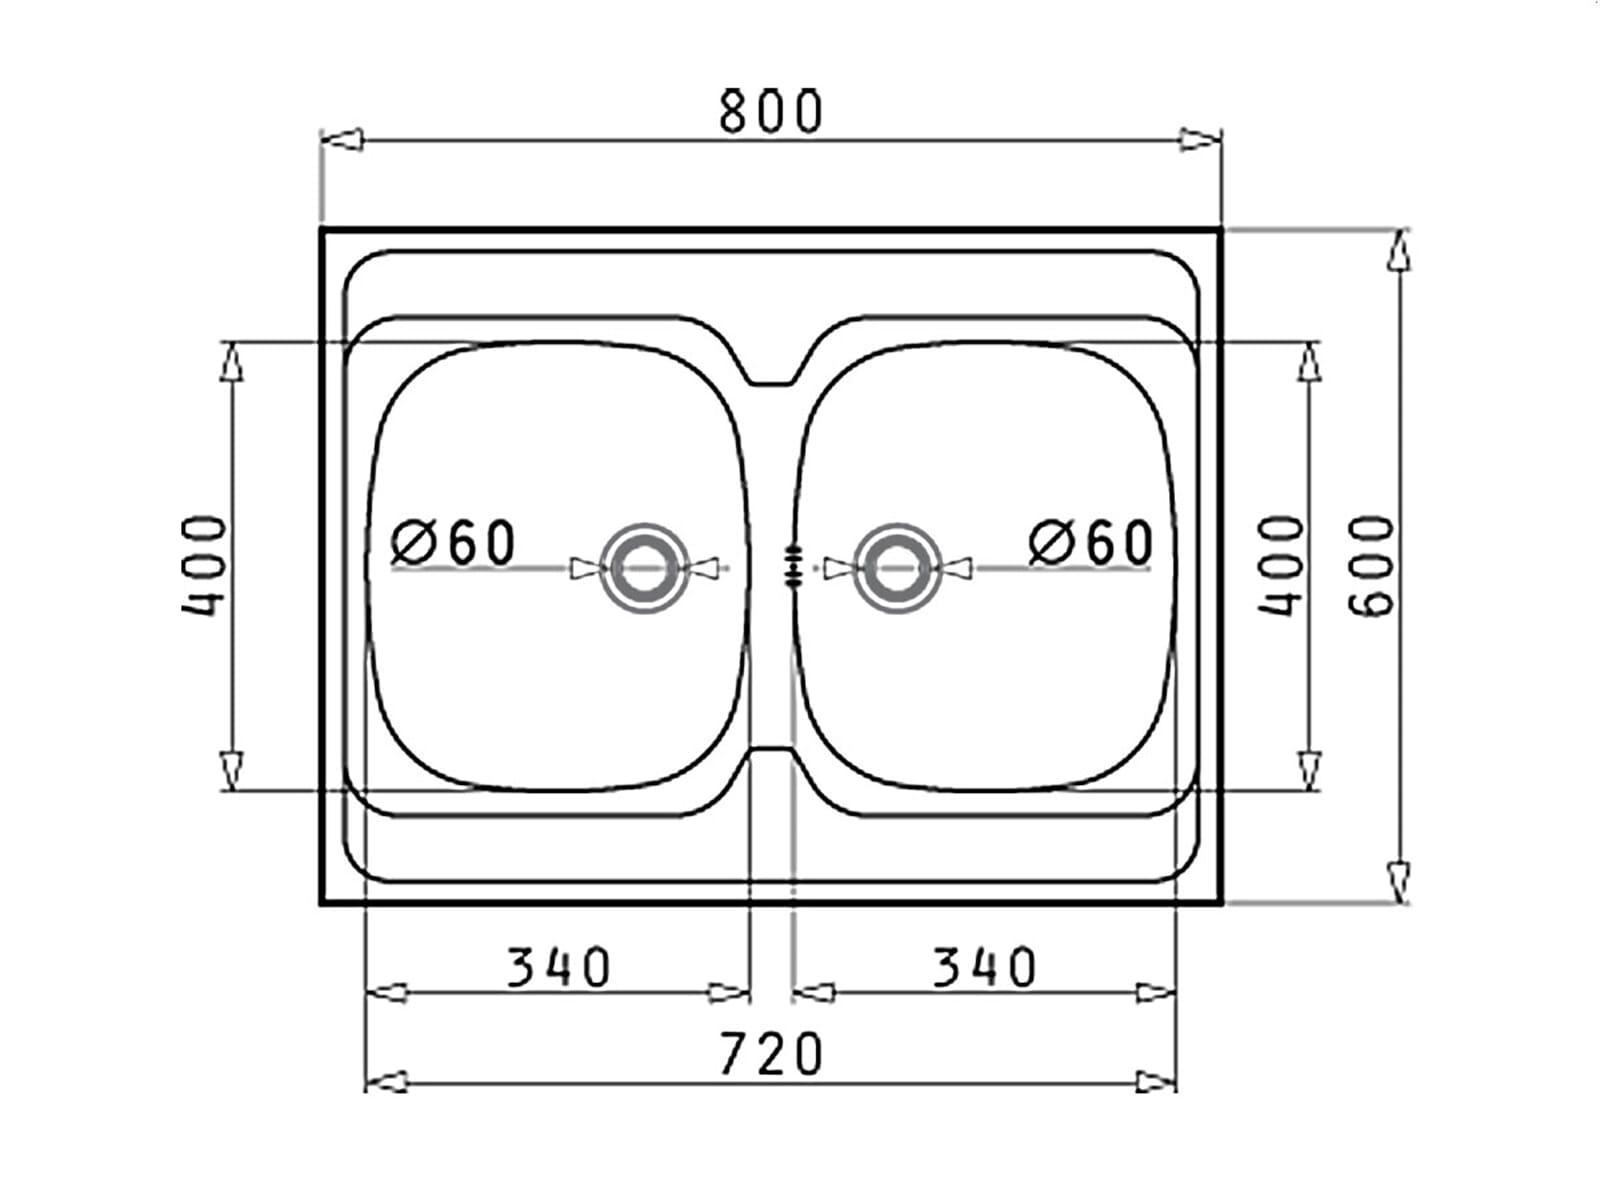 pyramis international 80x60 2b edelstahl sp le glatt 80 us auflagesp le ebay. Black Bedroom Furniture Sets. Home Design Ideas